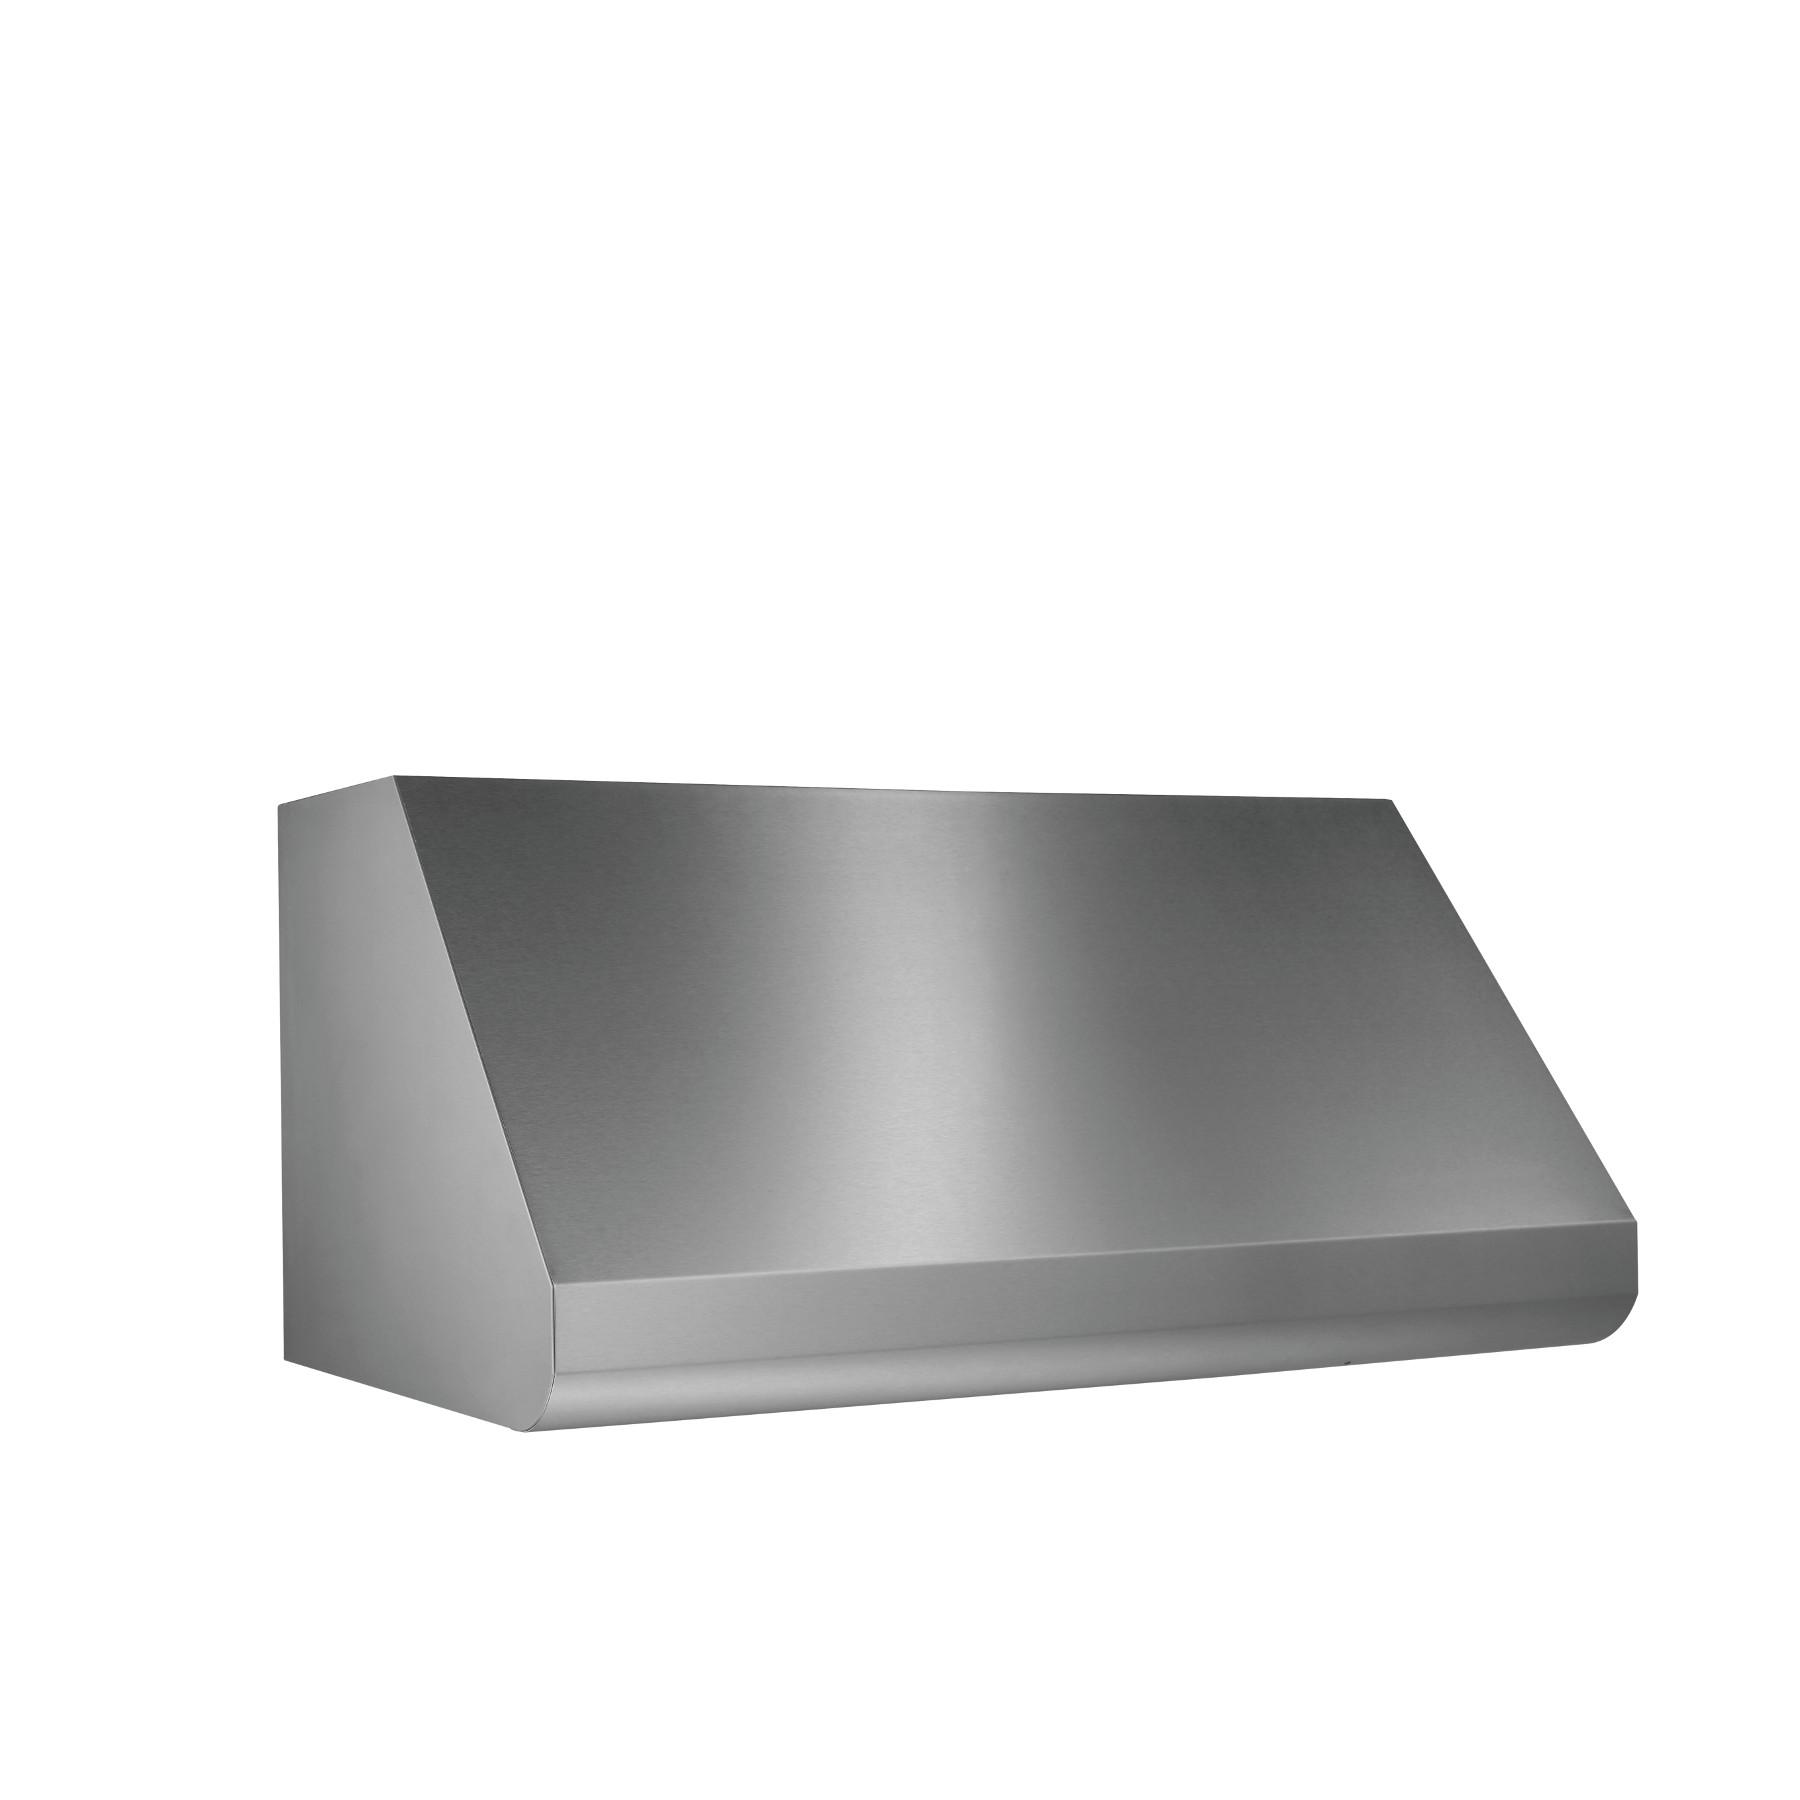 42 inch canopy wall mount range hood